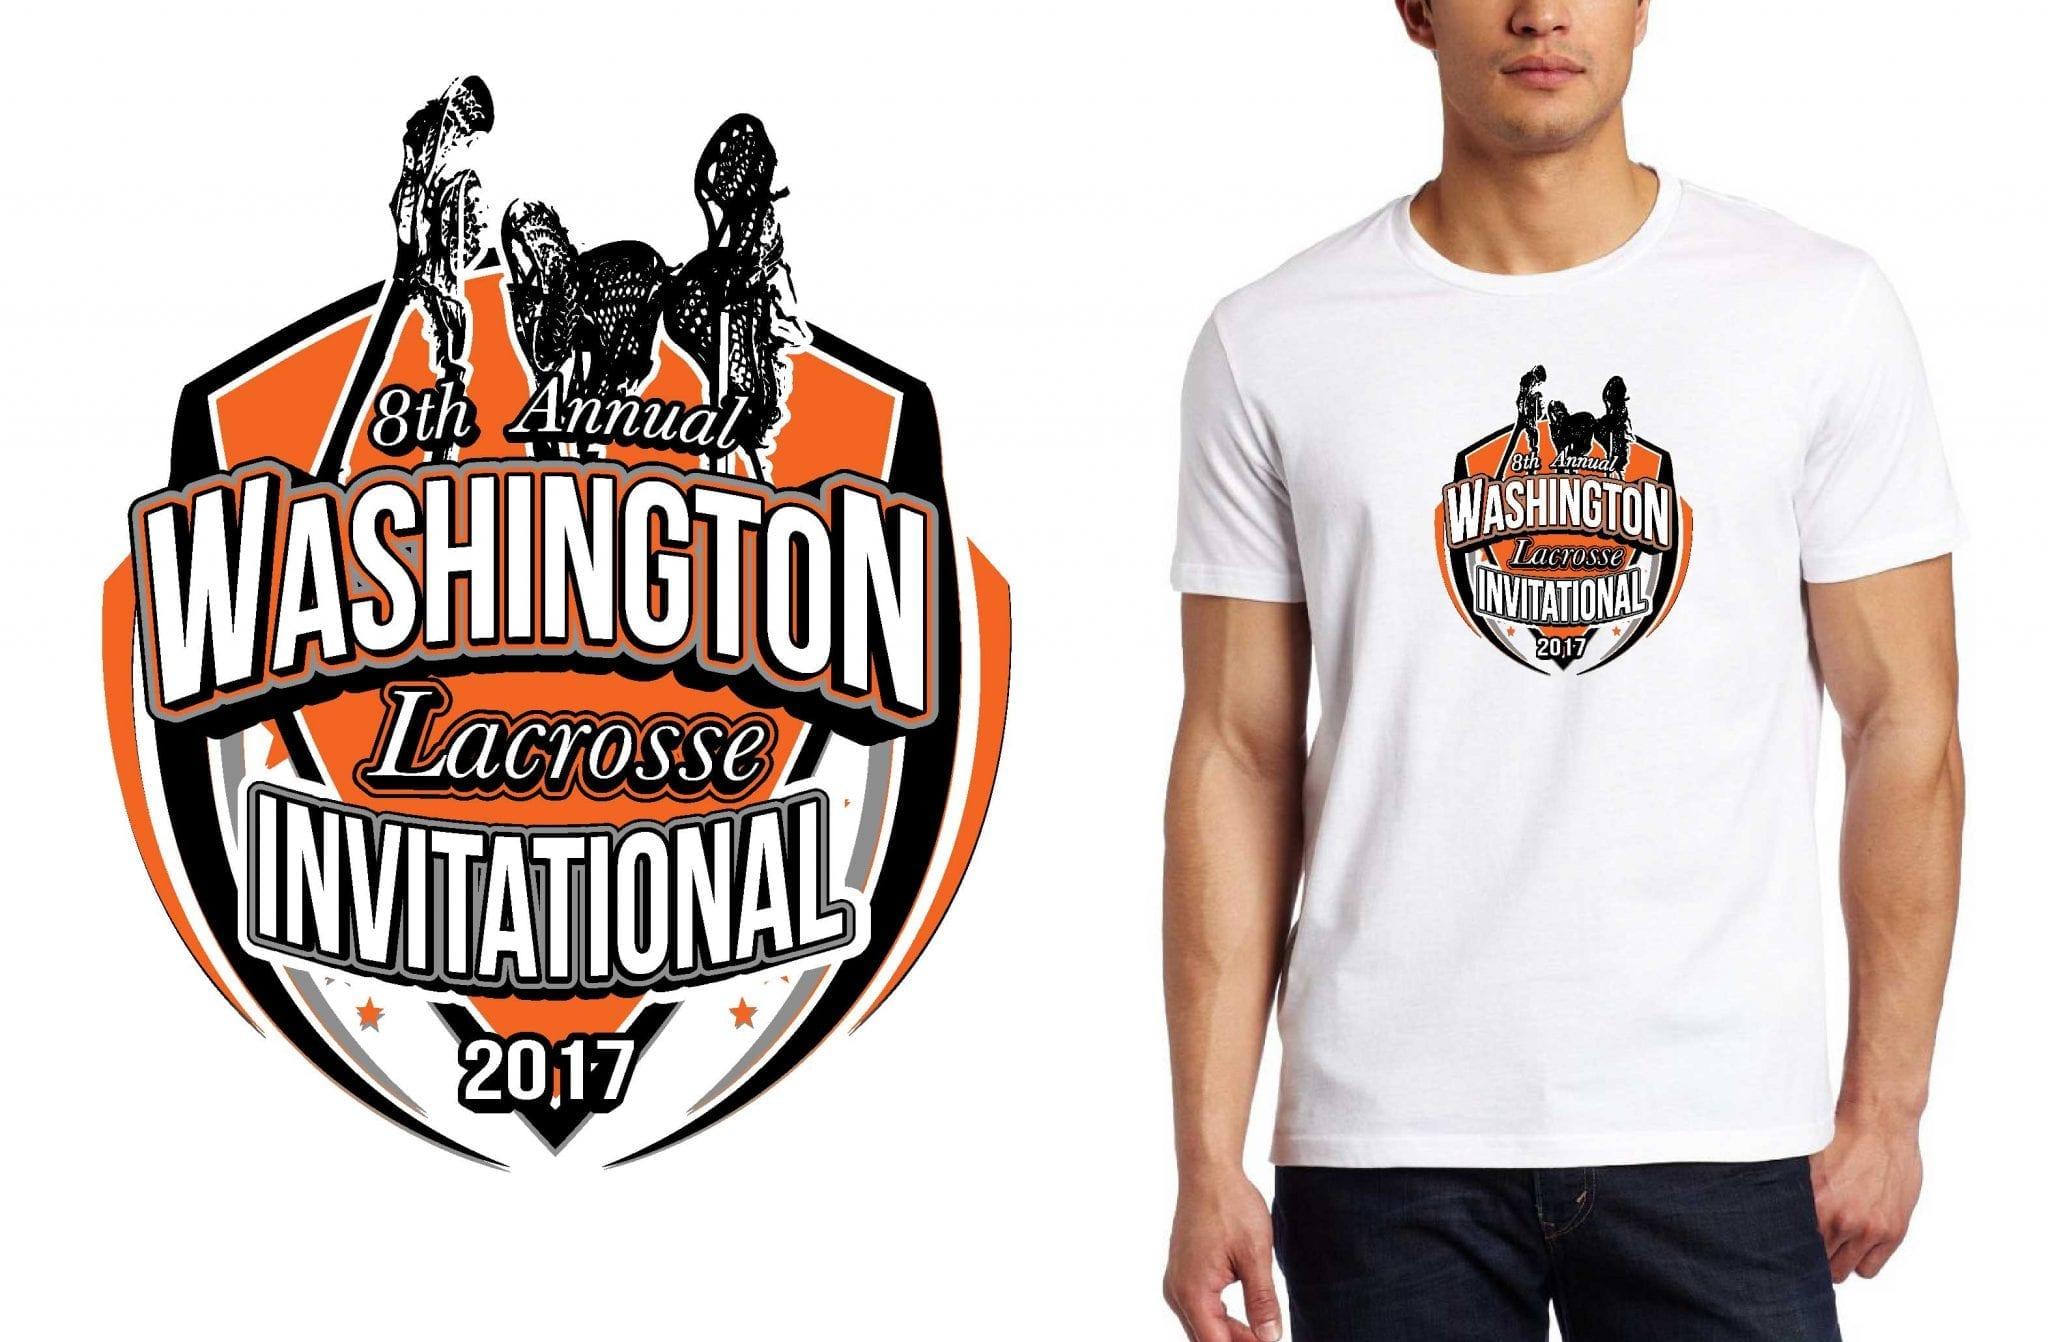 LOGO for 8th-Annual-Washington-Lacrosse-Invitational T-SHIRT UrArtStudio